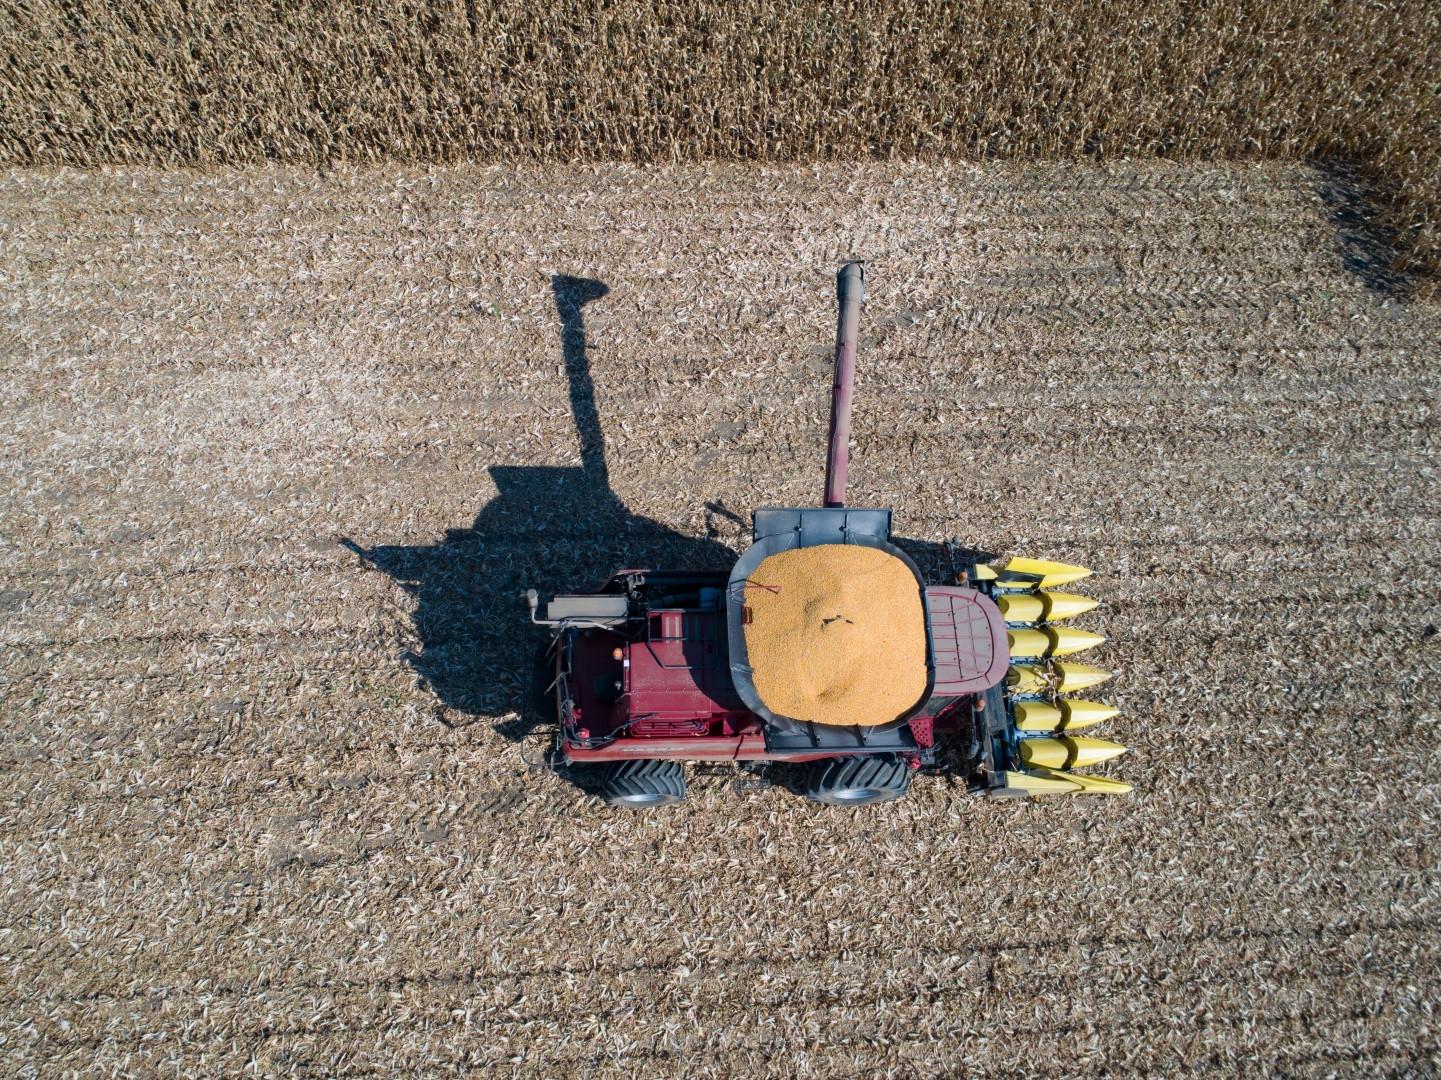 case-ih-axial-flow-harvest